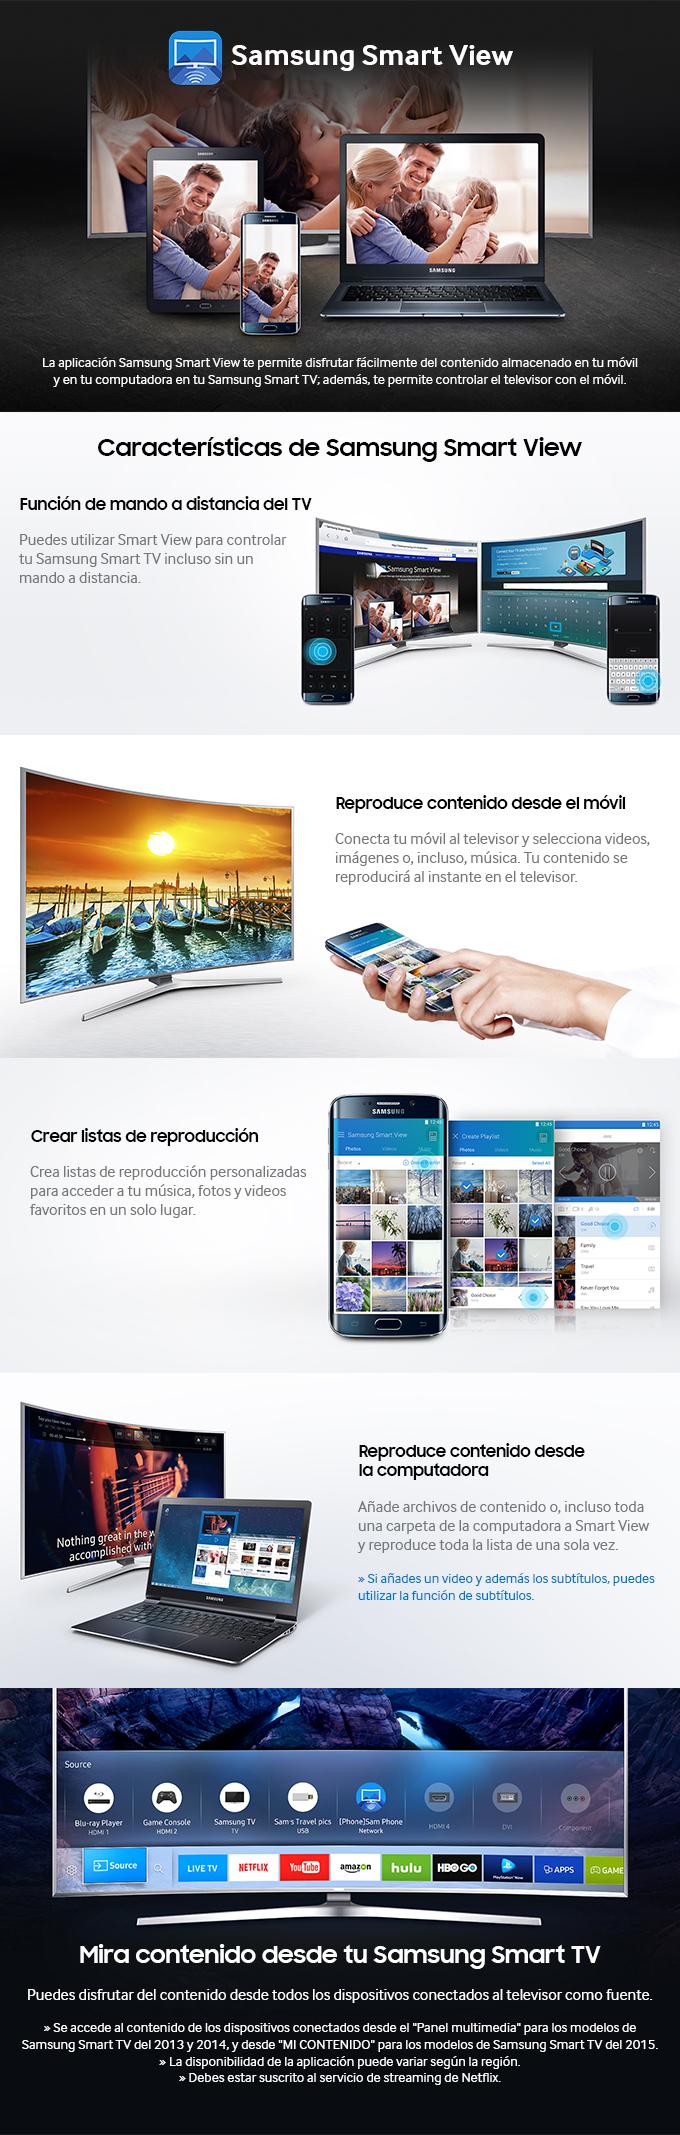 Características de Samsung Smart View